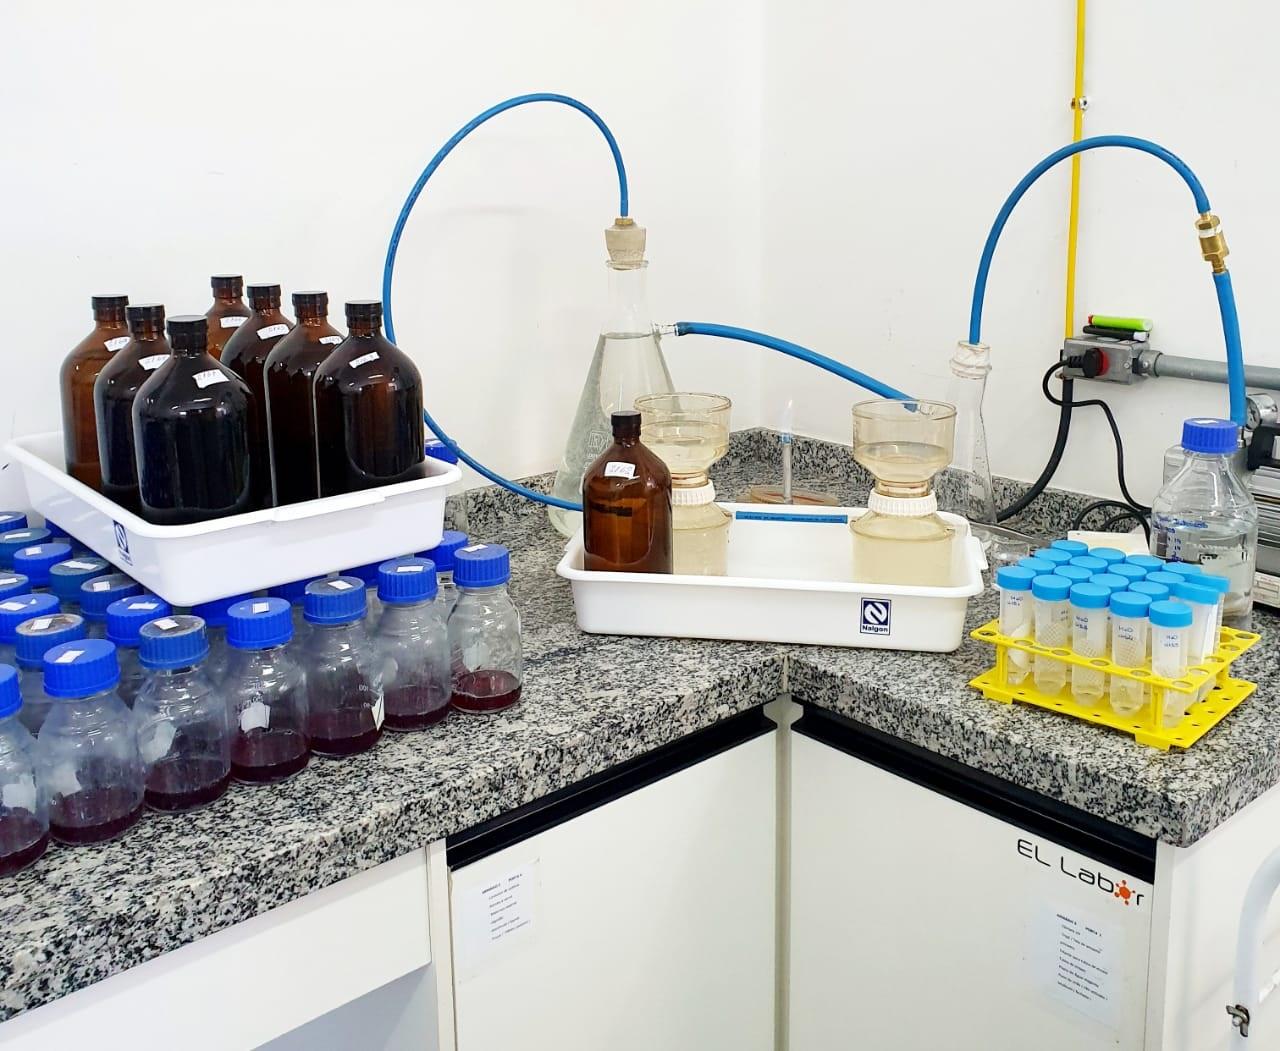 Análise de Legionella em SP - 1